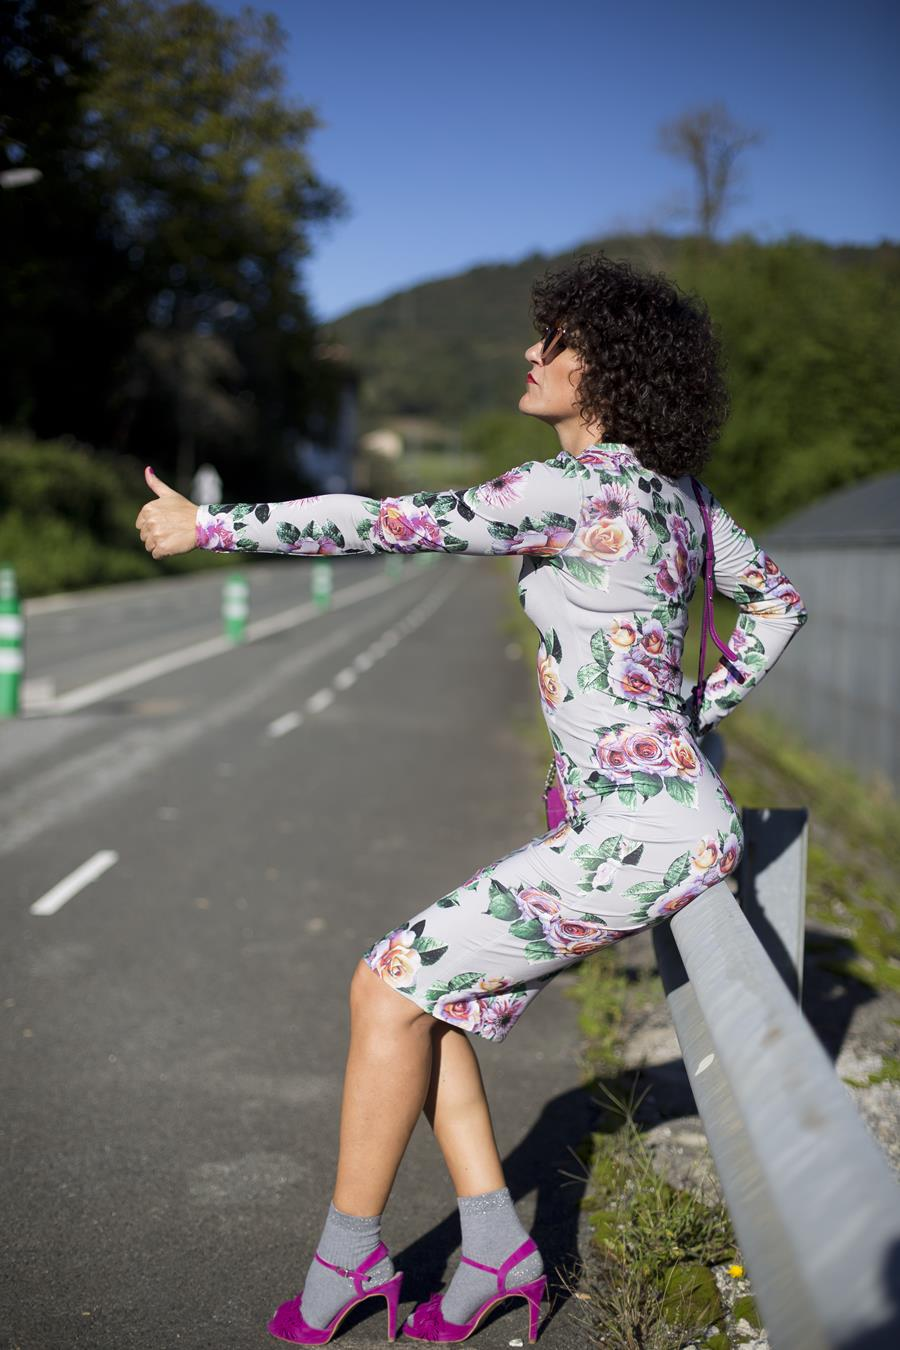 Rebeca Valdivia, personal shopper, estilista, stilist, Donostia, San Sebastián, Miss Clov, curls, rizos, curlpower, Vestido de flores, vestido pegado, flores rosas, pink flowers, sandals with socks, sandalias con calcetines, bag, bolso bandolera, flower dress